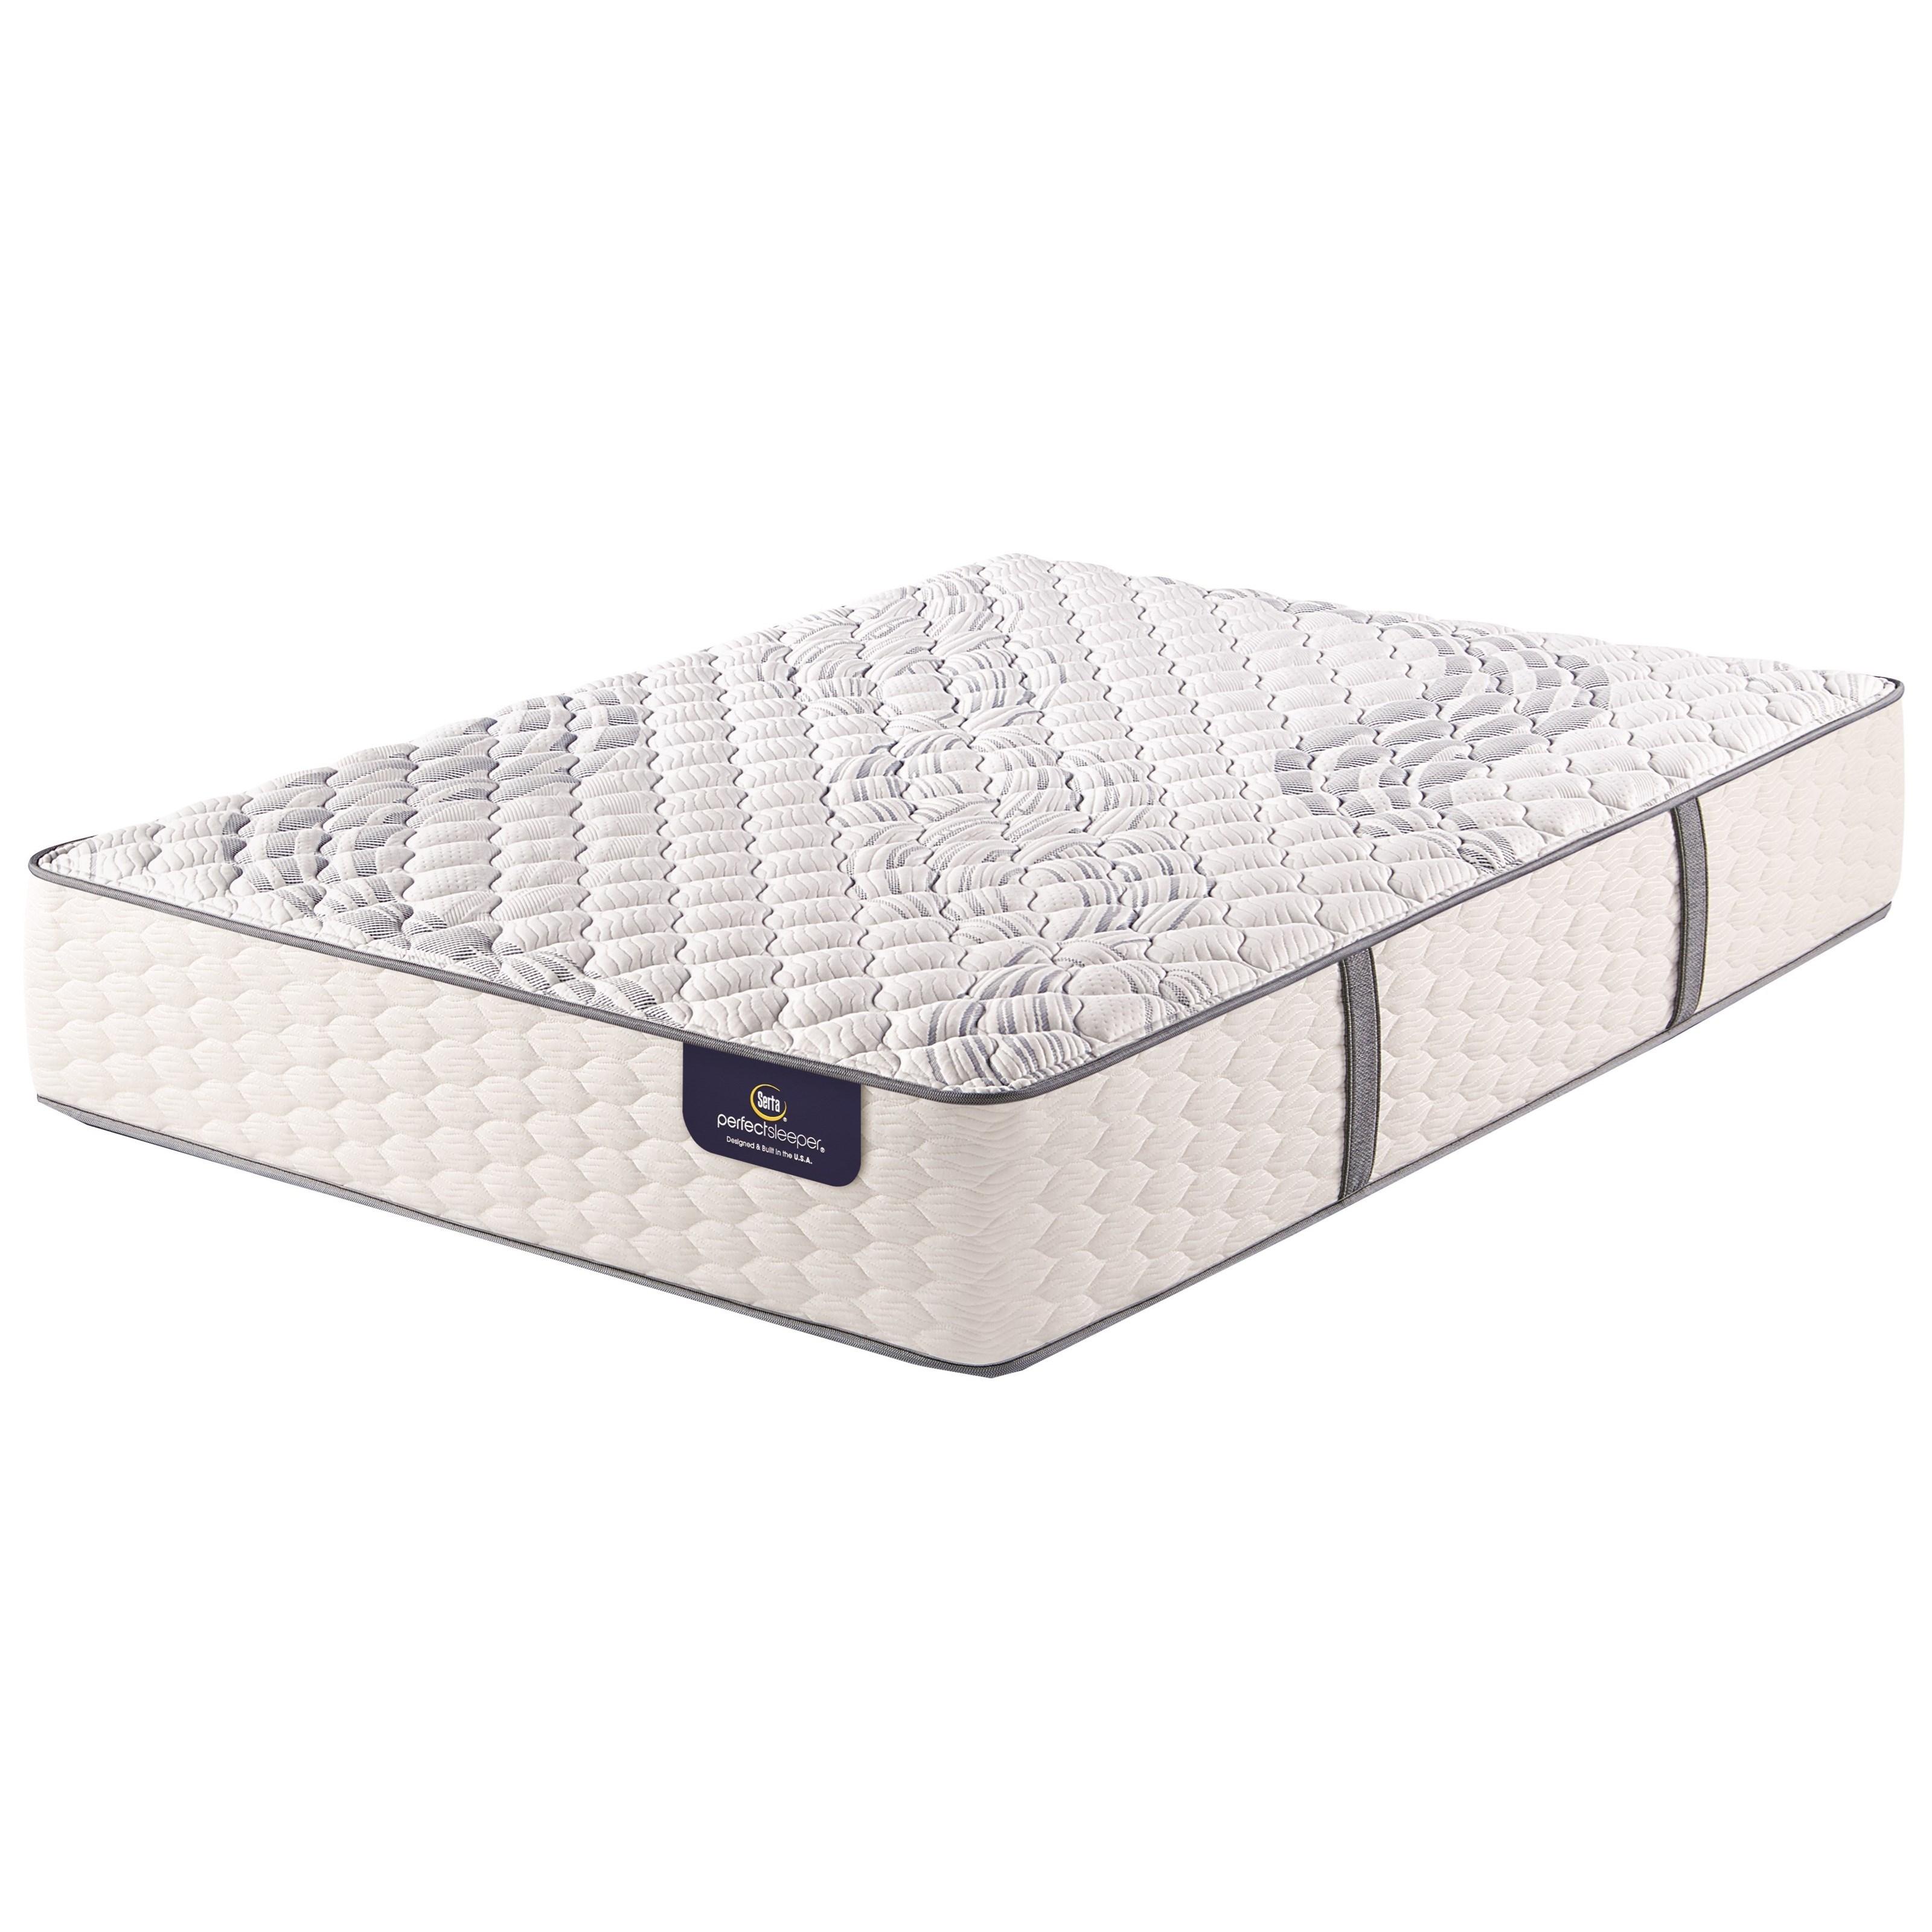 serta sedgewick queen extra firm mattress item number pseextrafirm q - Extra Firm Mattress